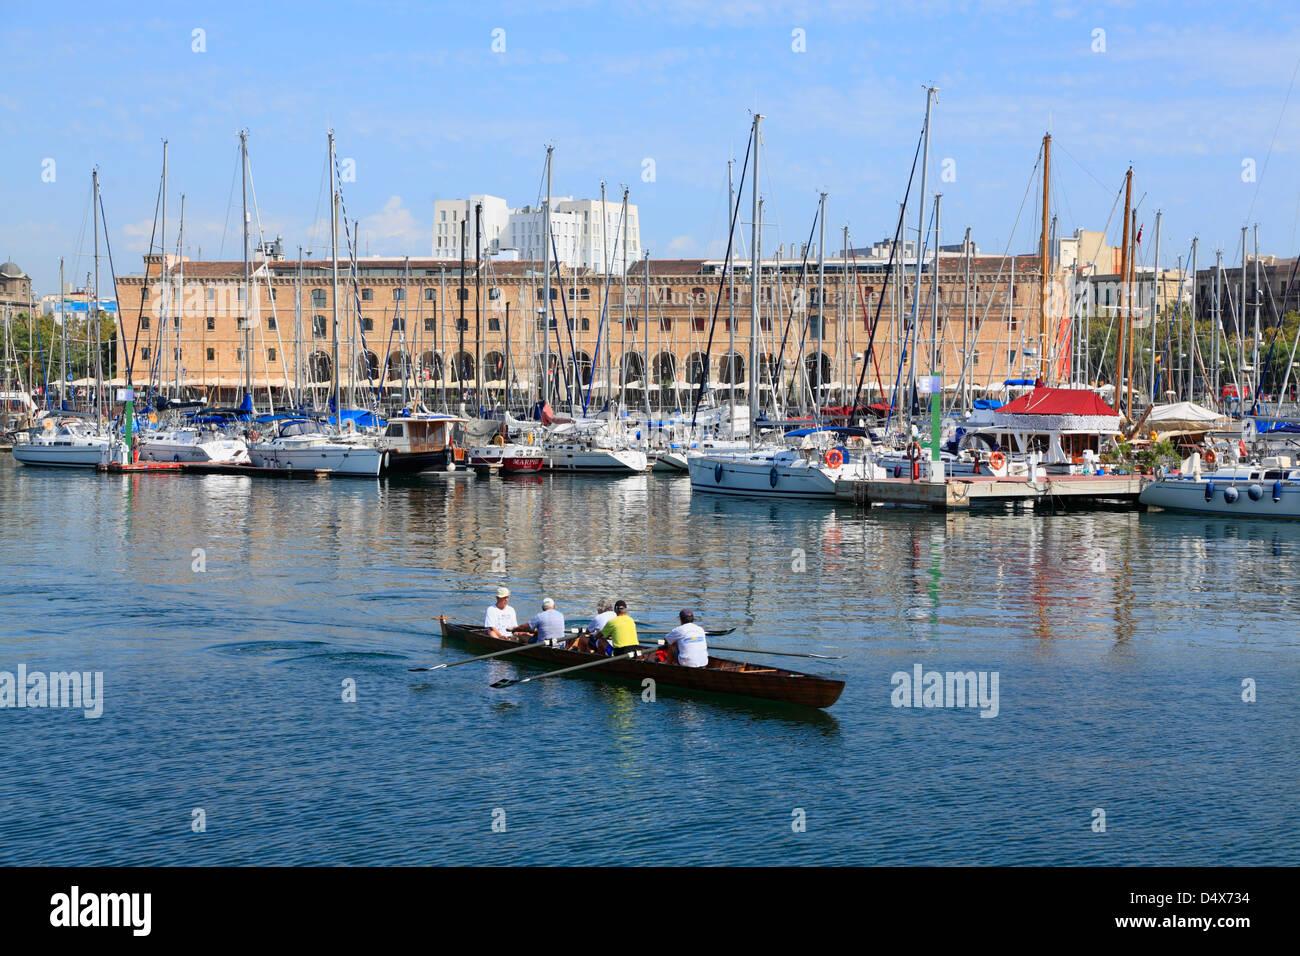 Boats in Port Vell harbor, Barcelona, Spain - Stock Image